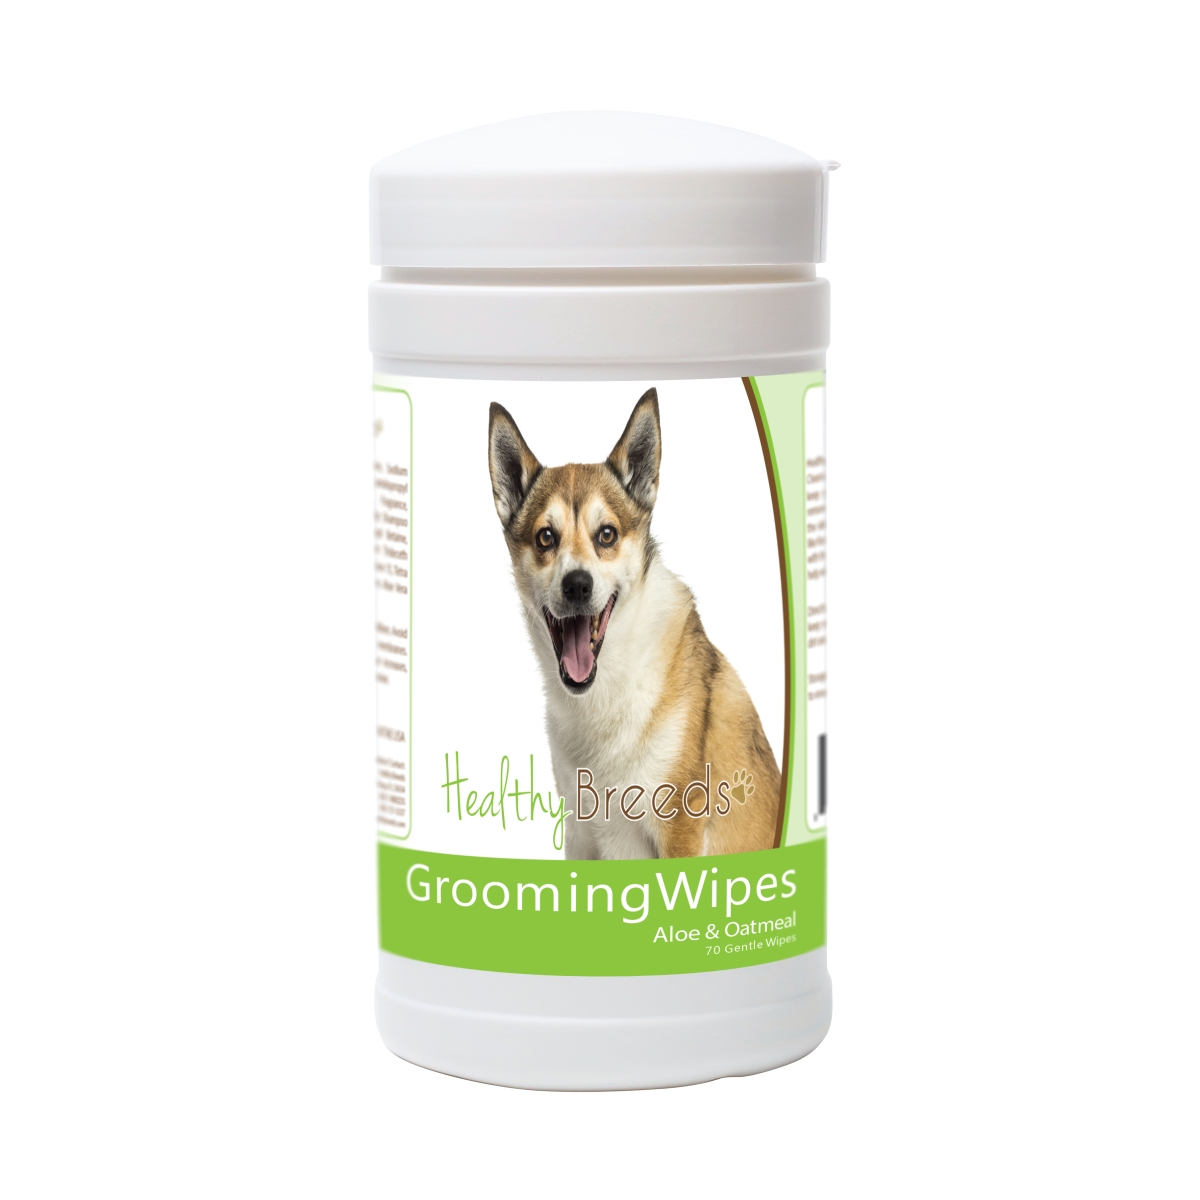 Healthy Breeds 840235174844 Norwegian Lundehund Grooming Wipes - 70 Count